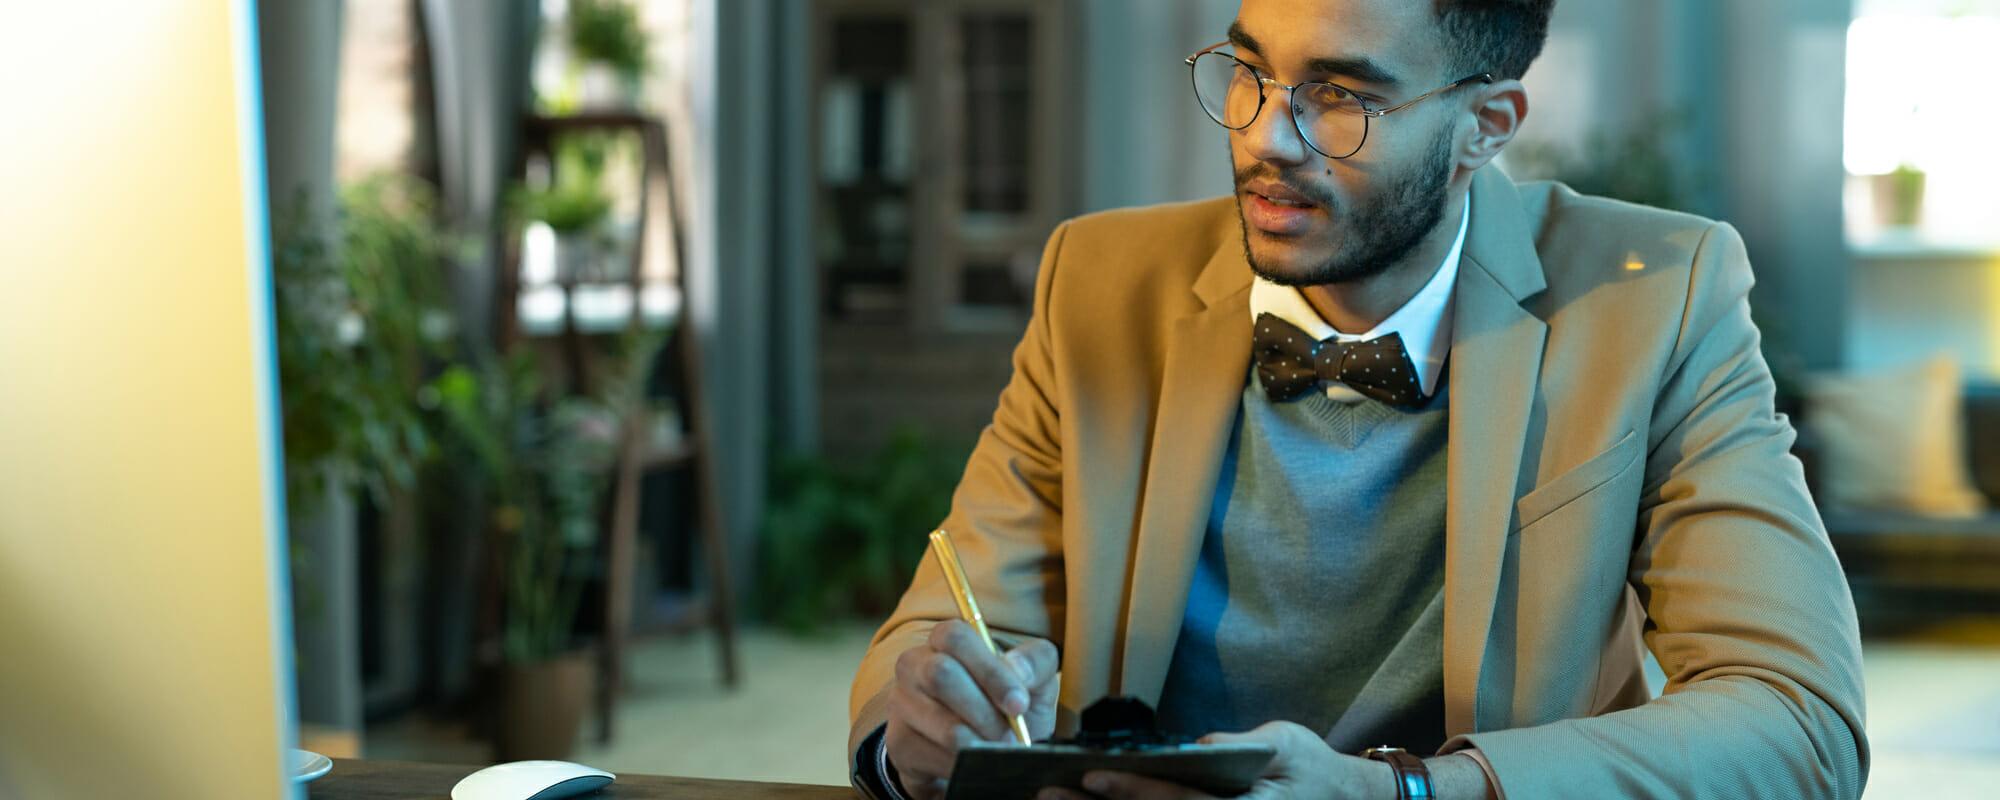 Business meeting online